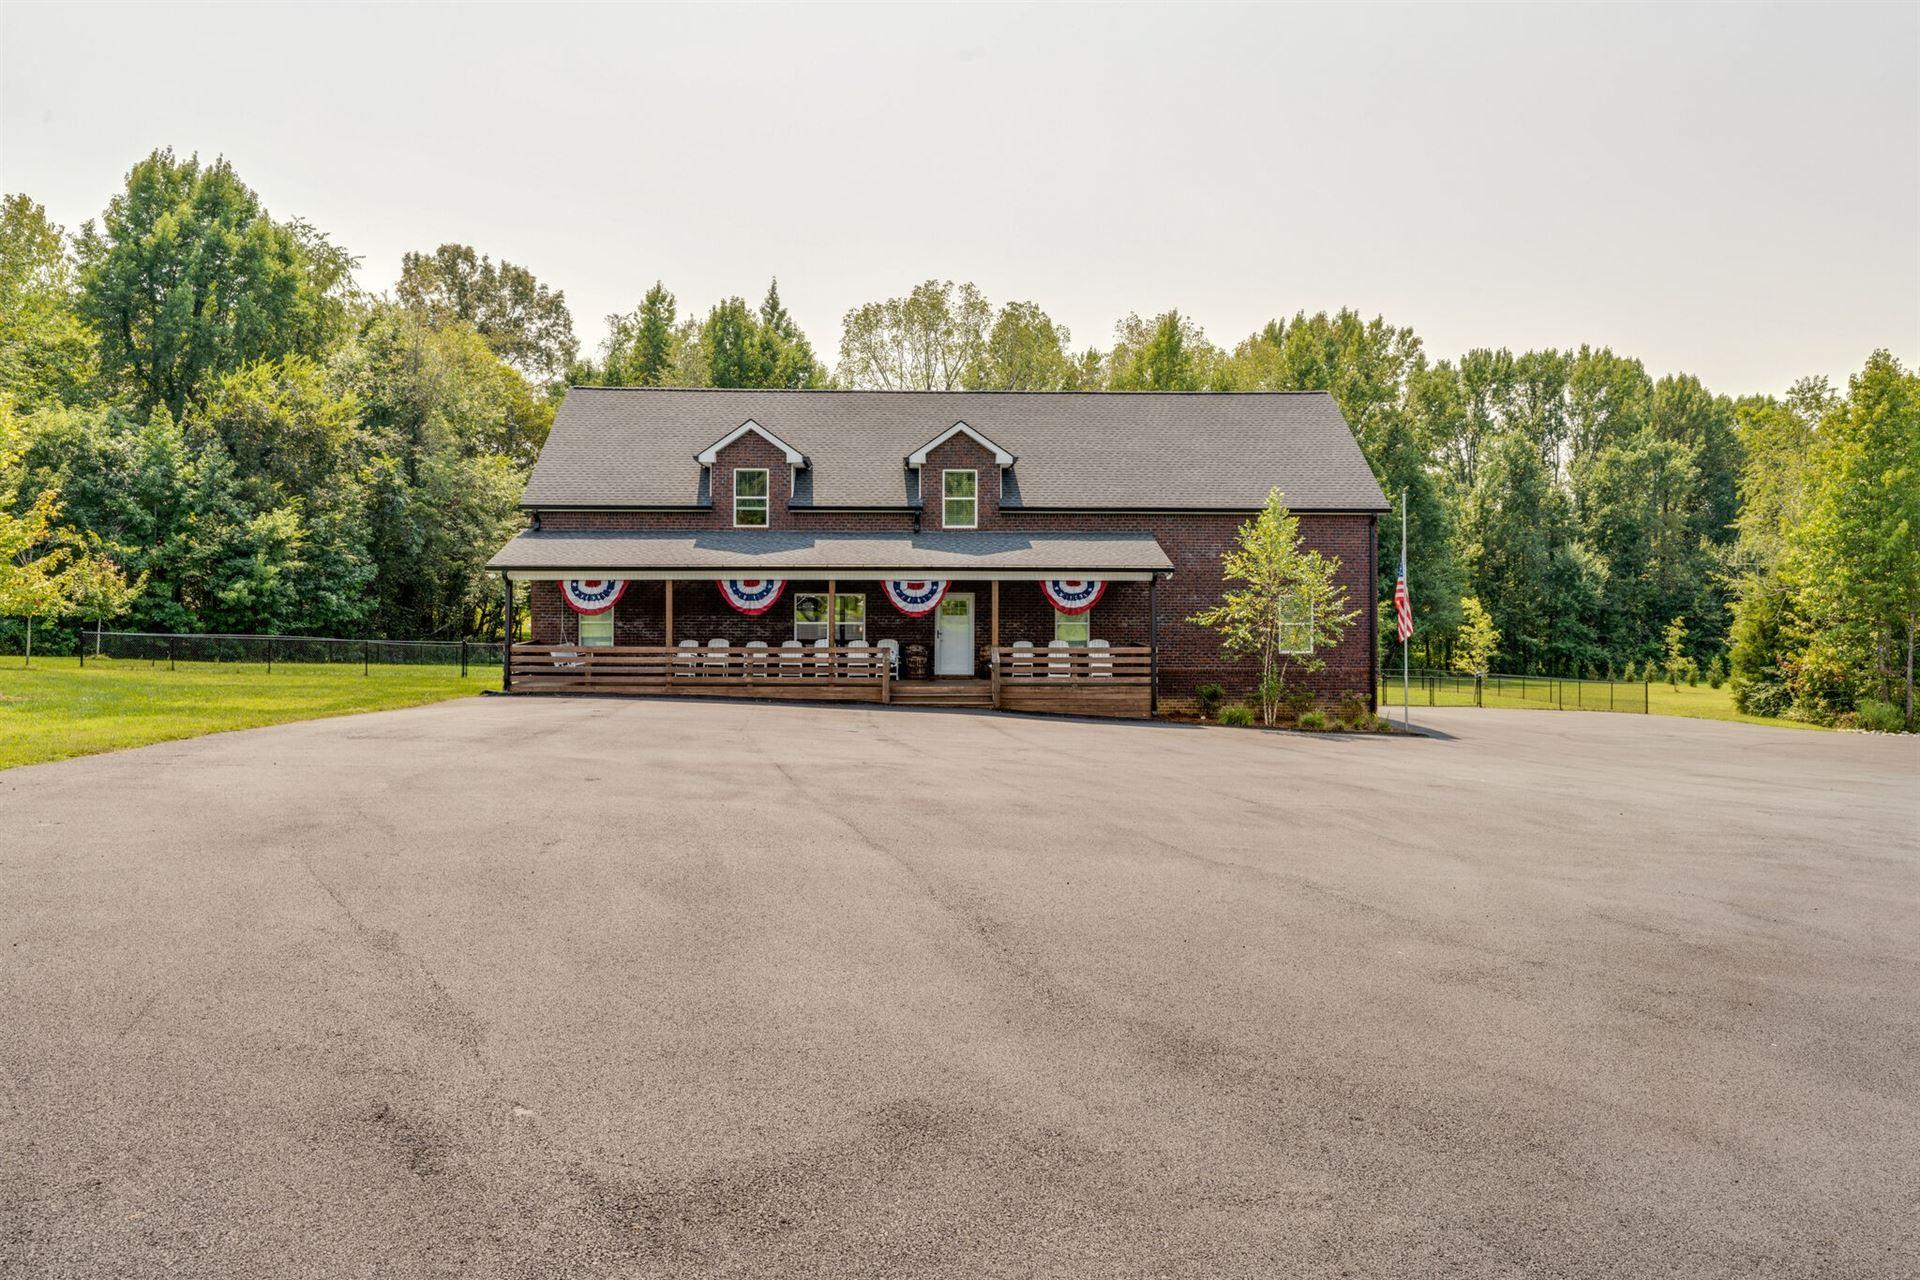 604 Fowler Ford Rd, Portland, TN 37148 - MLS#: 2290929